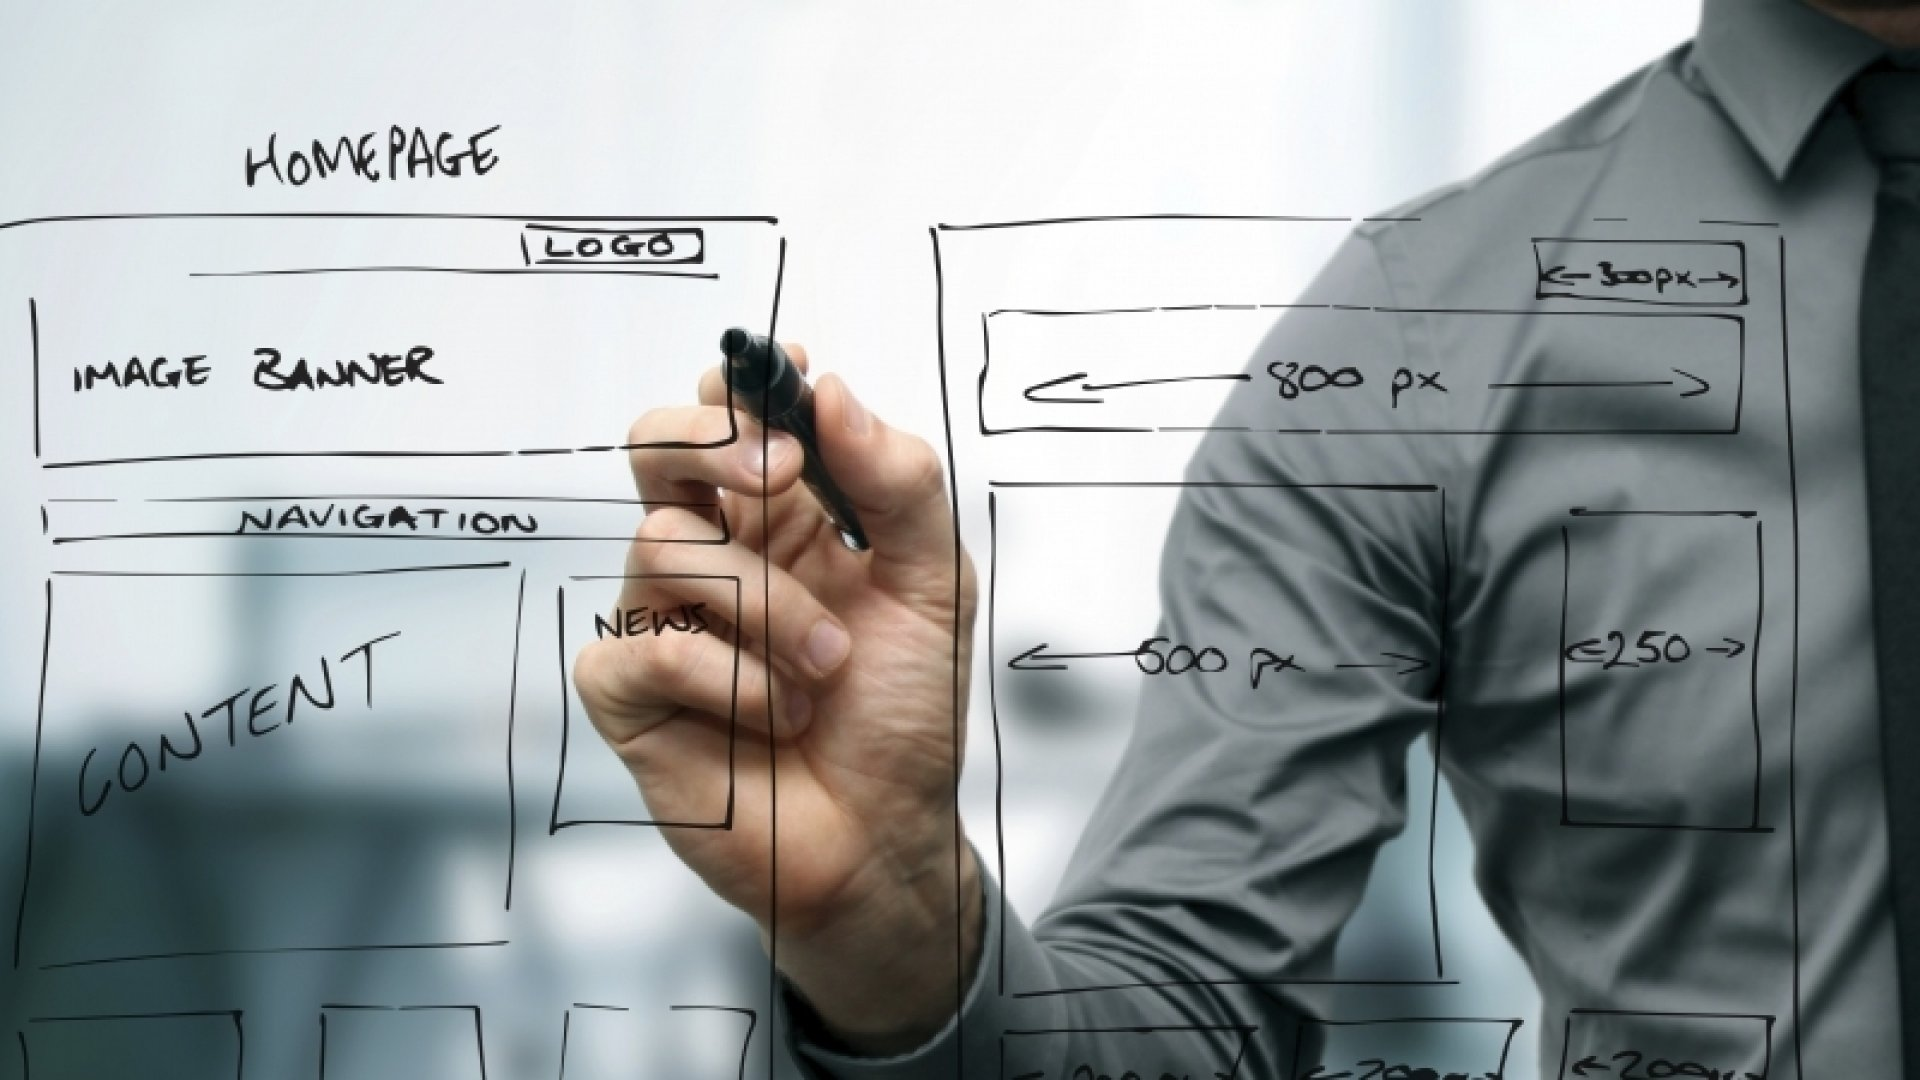 5 Easy Ways to Improve Your Website